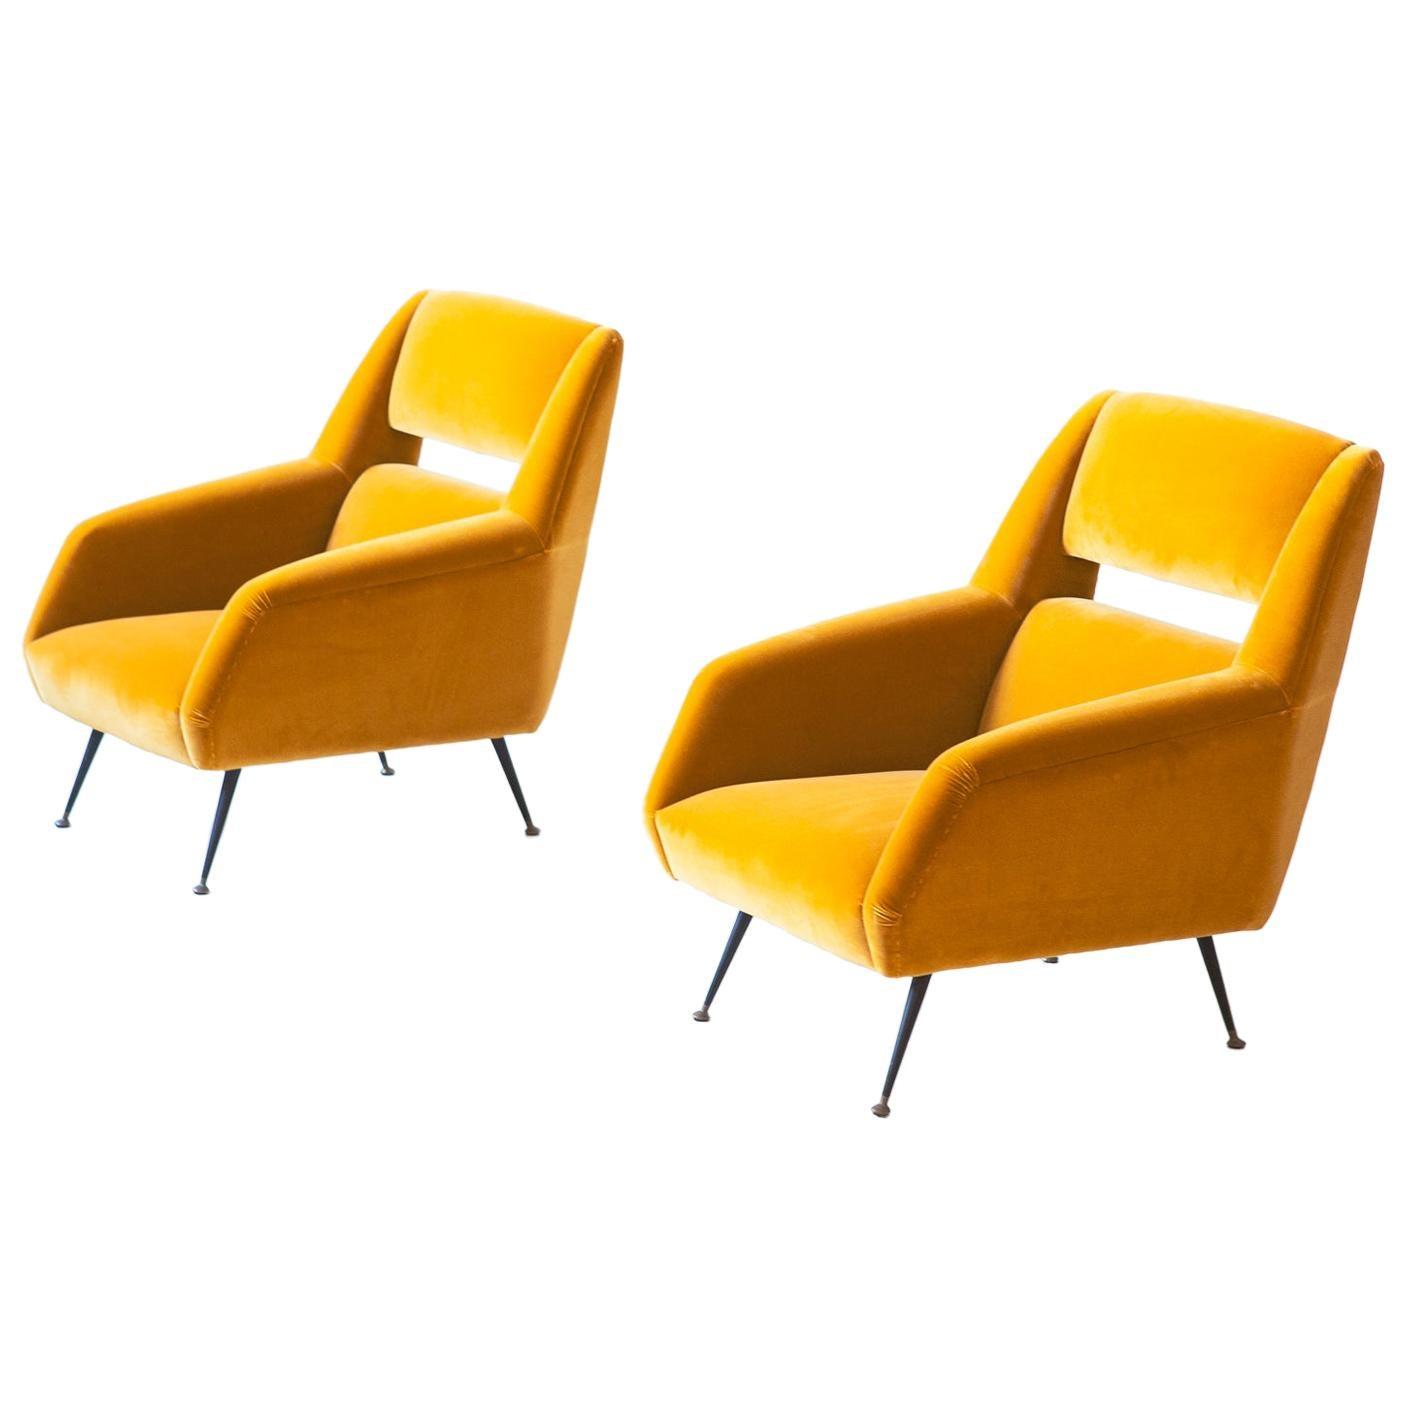 Reupholstered Italian Senape Yellow Velvet Lounge Chairs by Gigi Radice